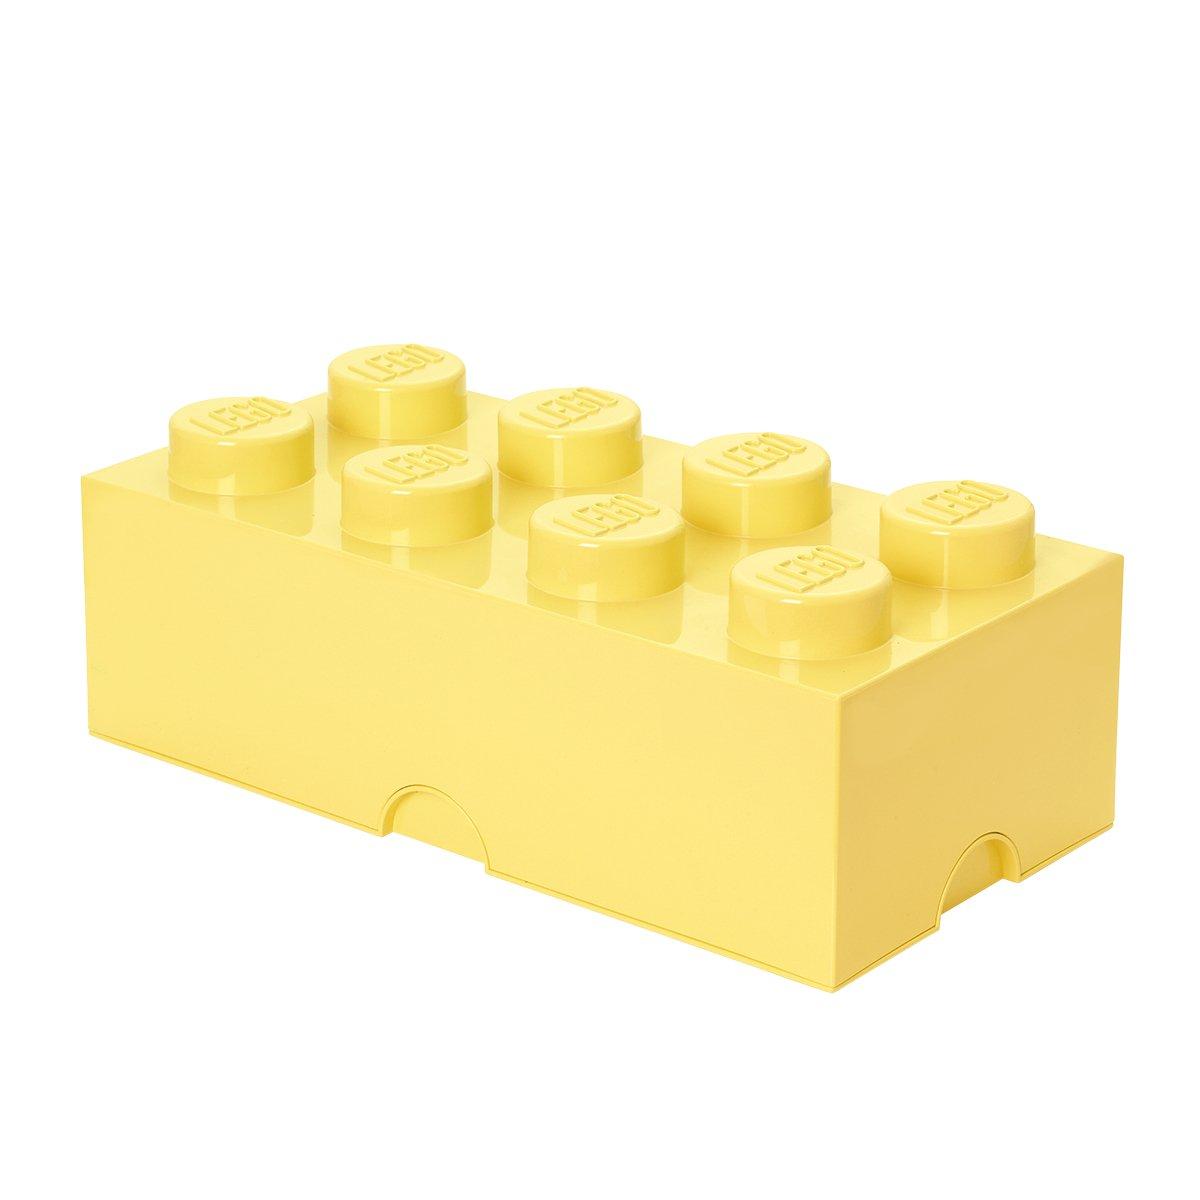 LEGO Storage Box Brick 8 DIF Cool Yellow, Large